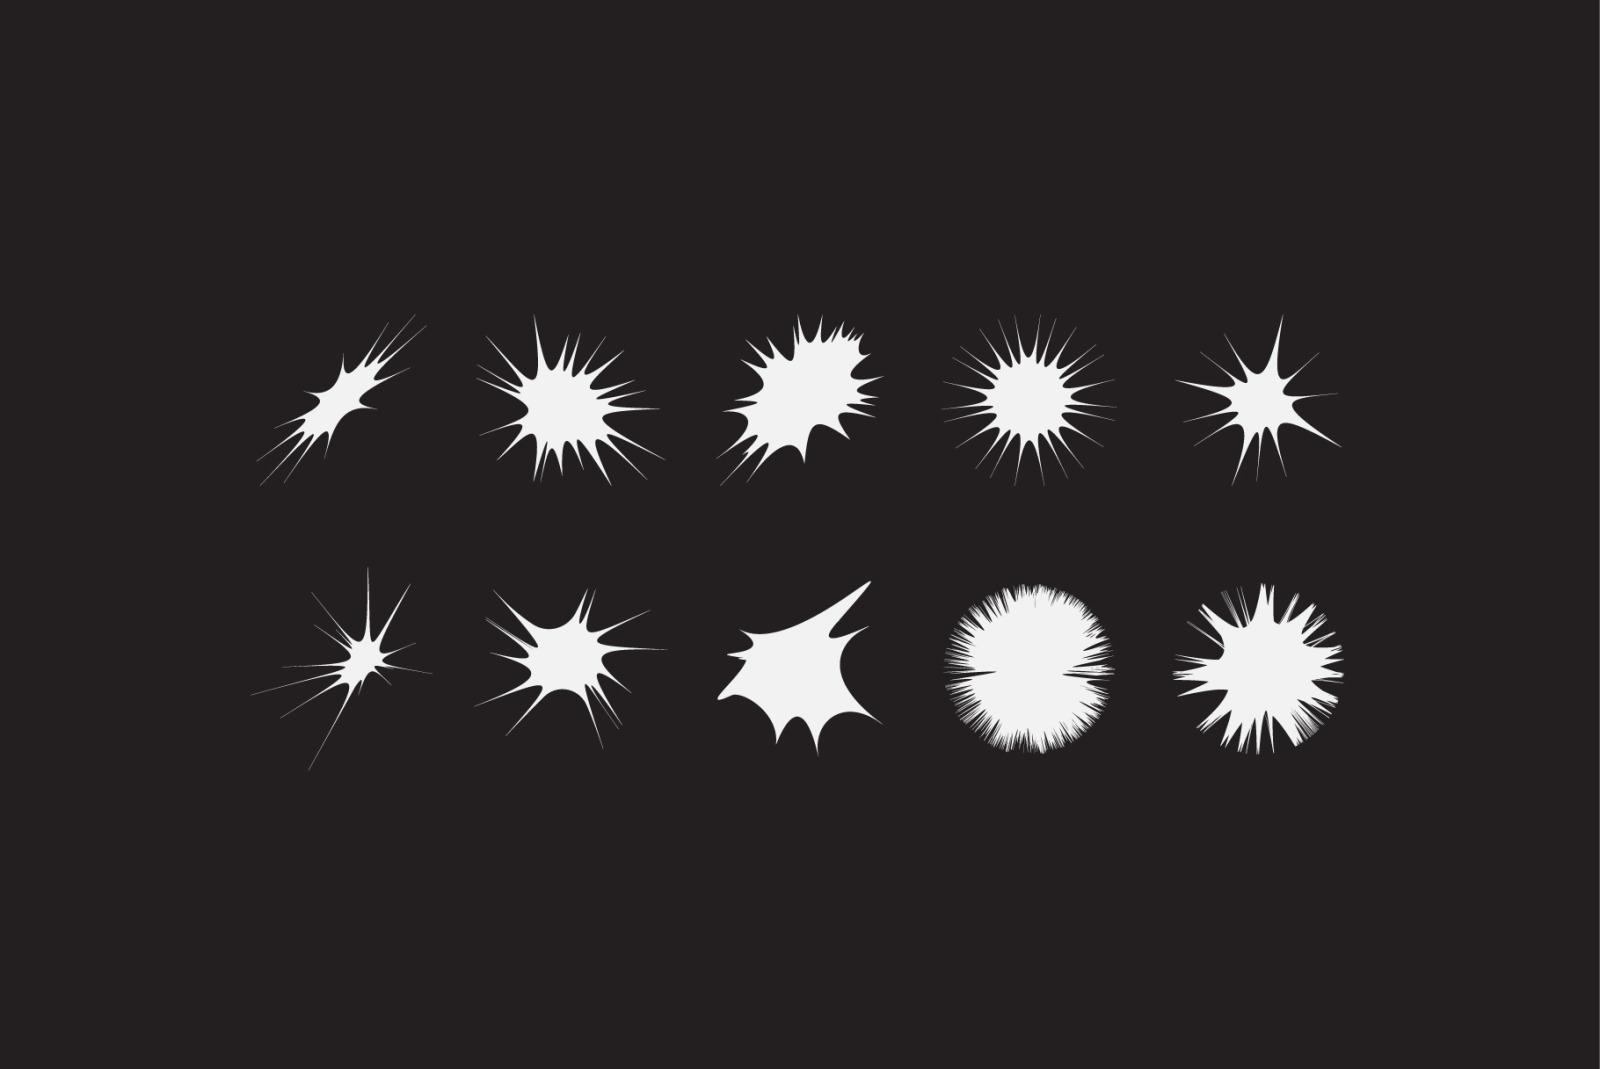 100 Geometric Vector Star Shapes